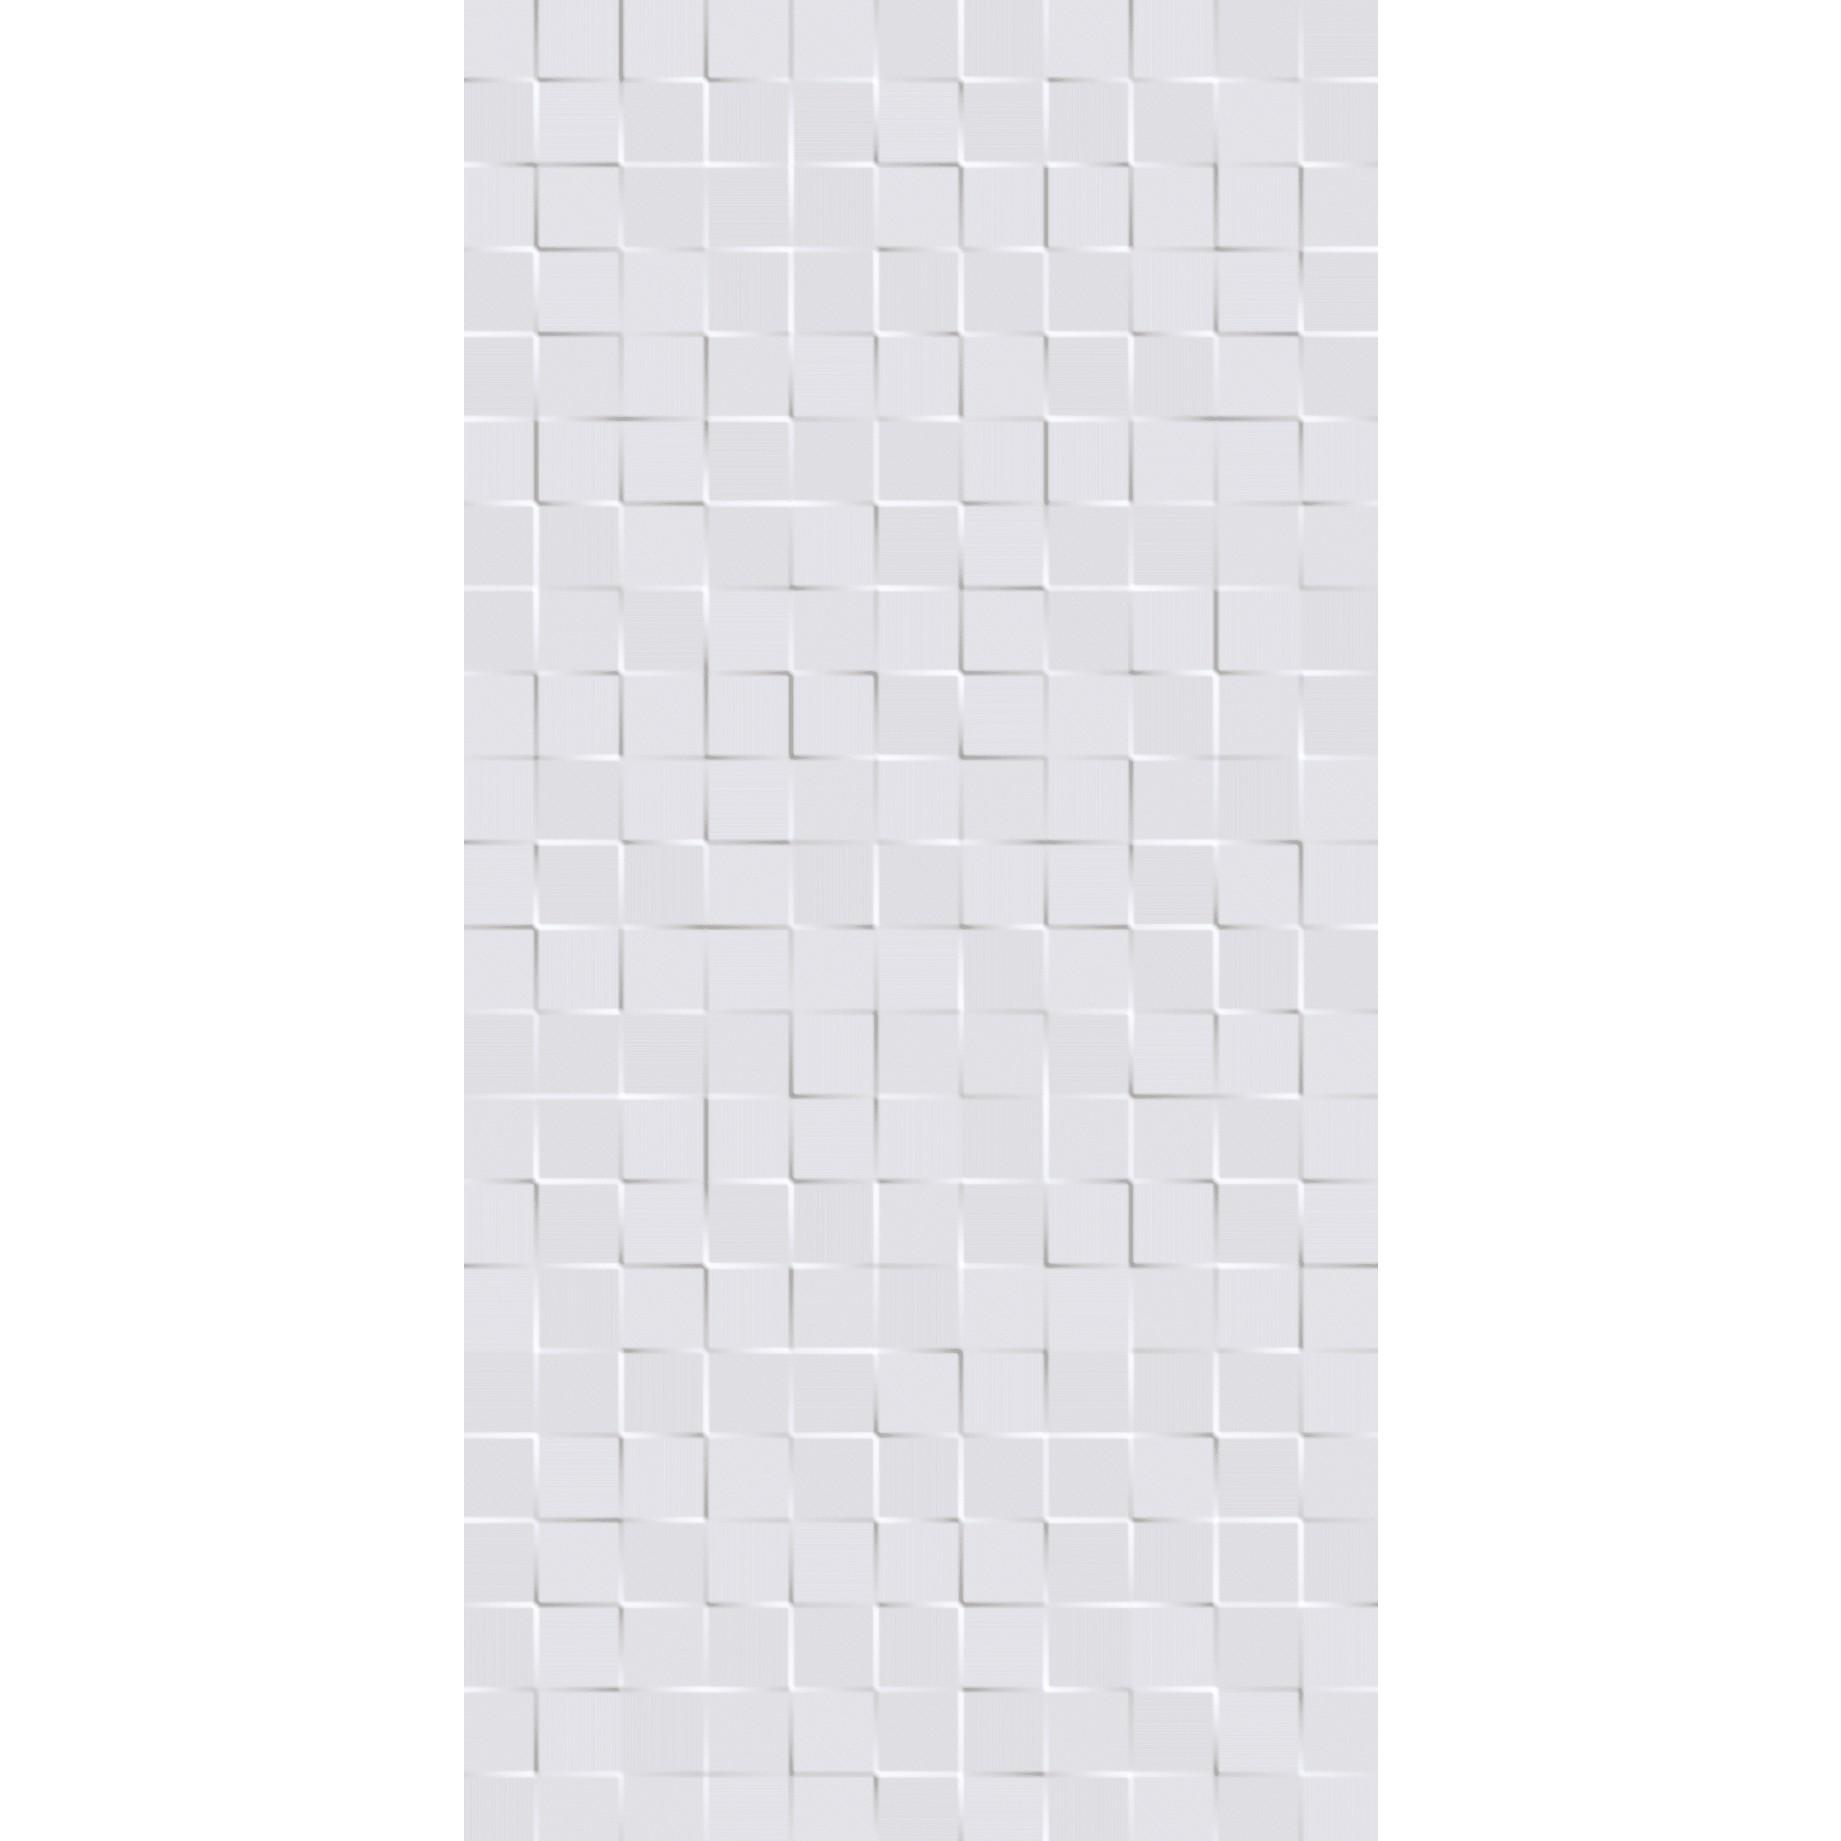 Revestimento Tipo A Quantum Bianco 45x90 cm - Biancogres